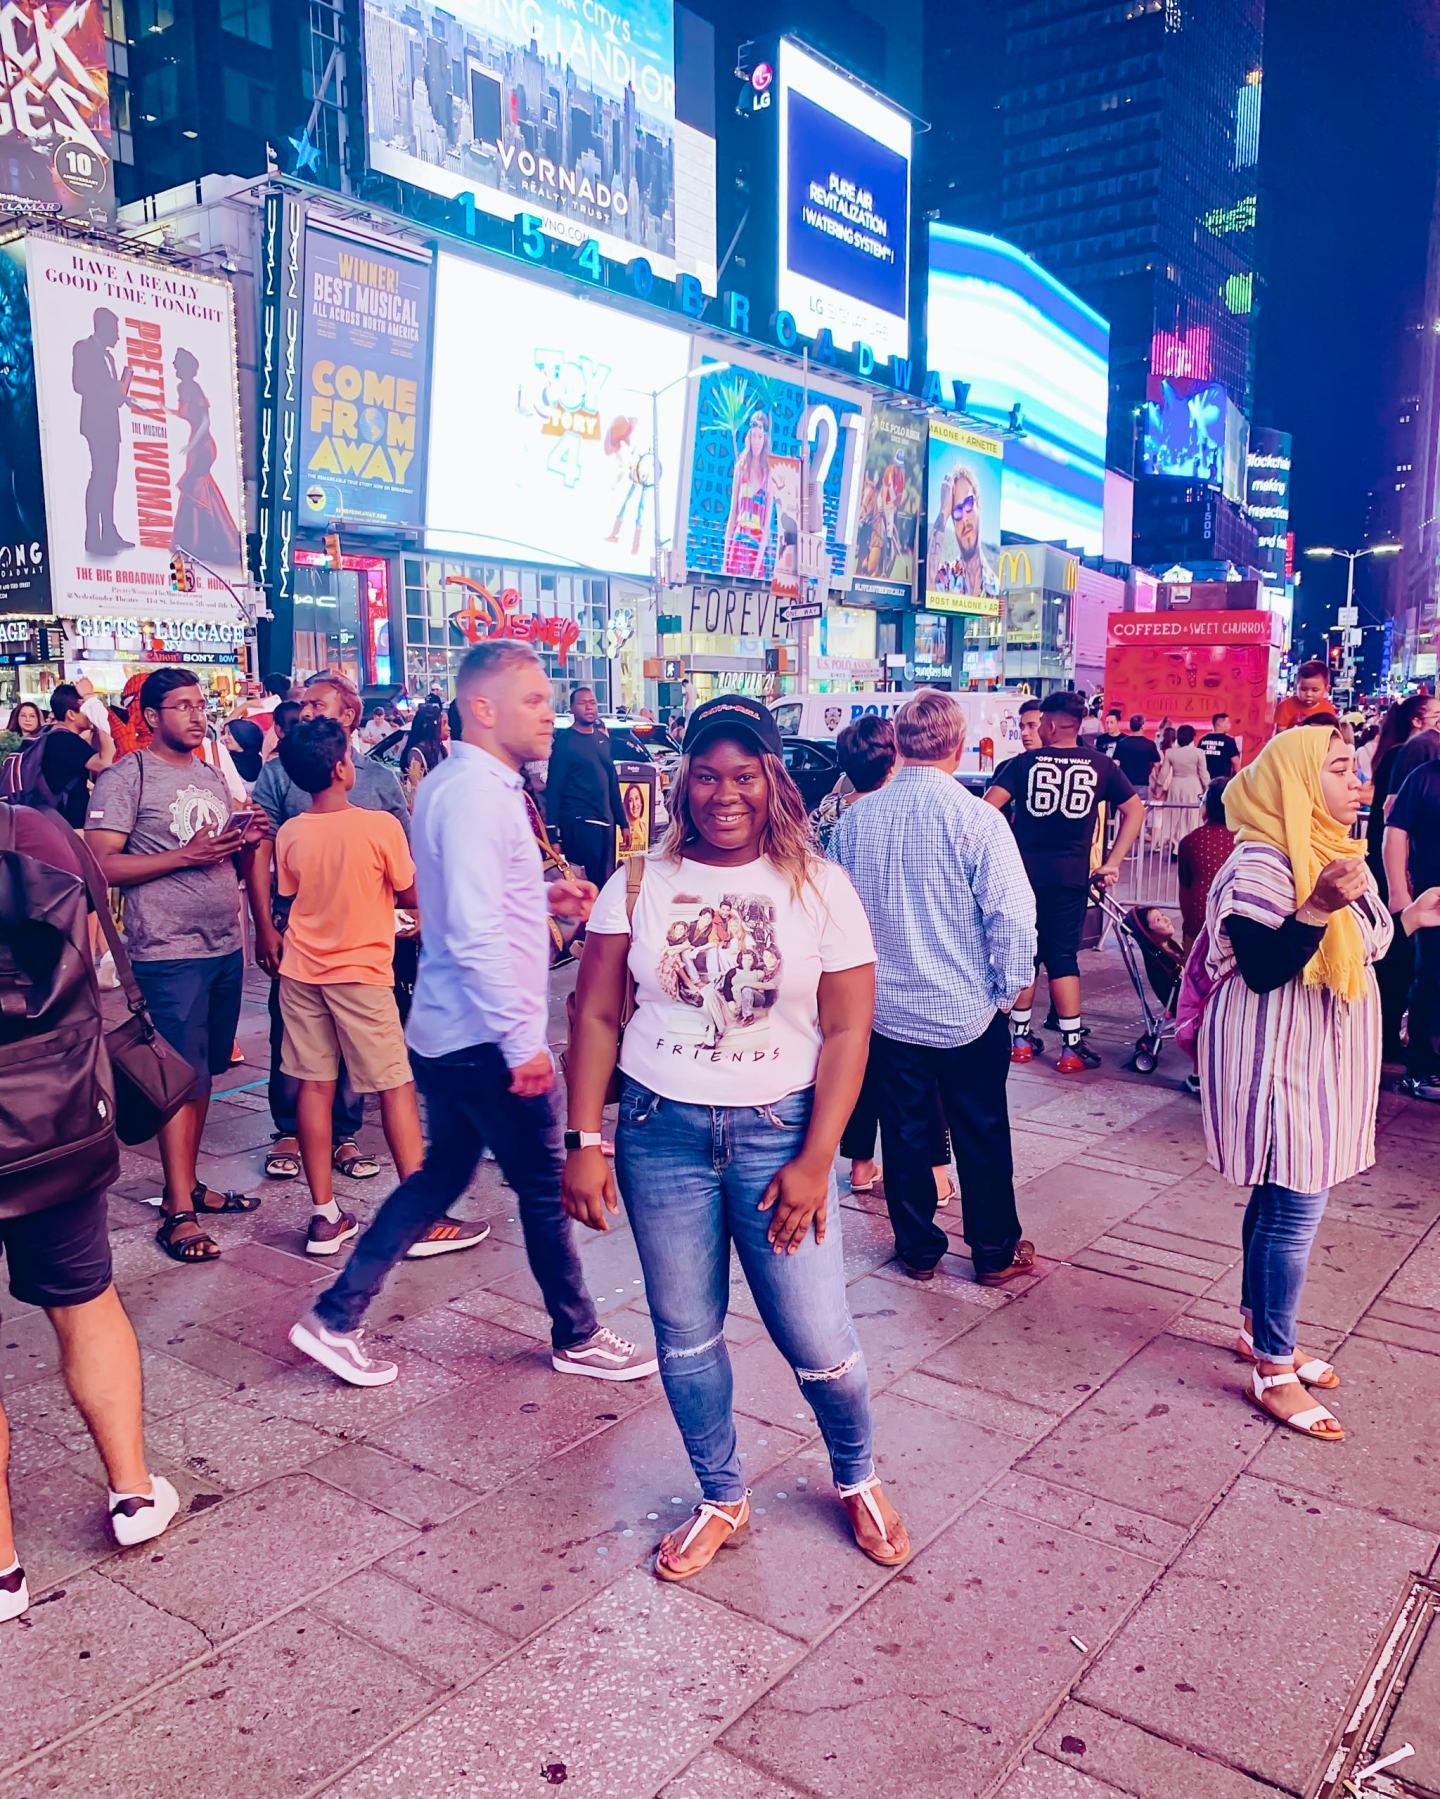 Vera in Time Square - New York Travel